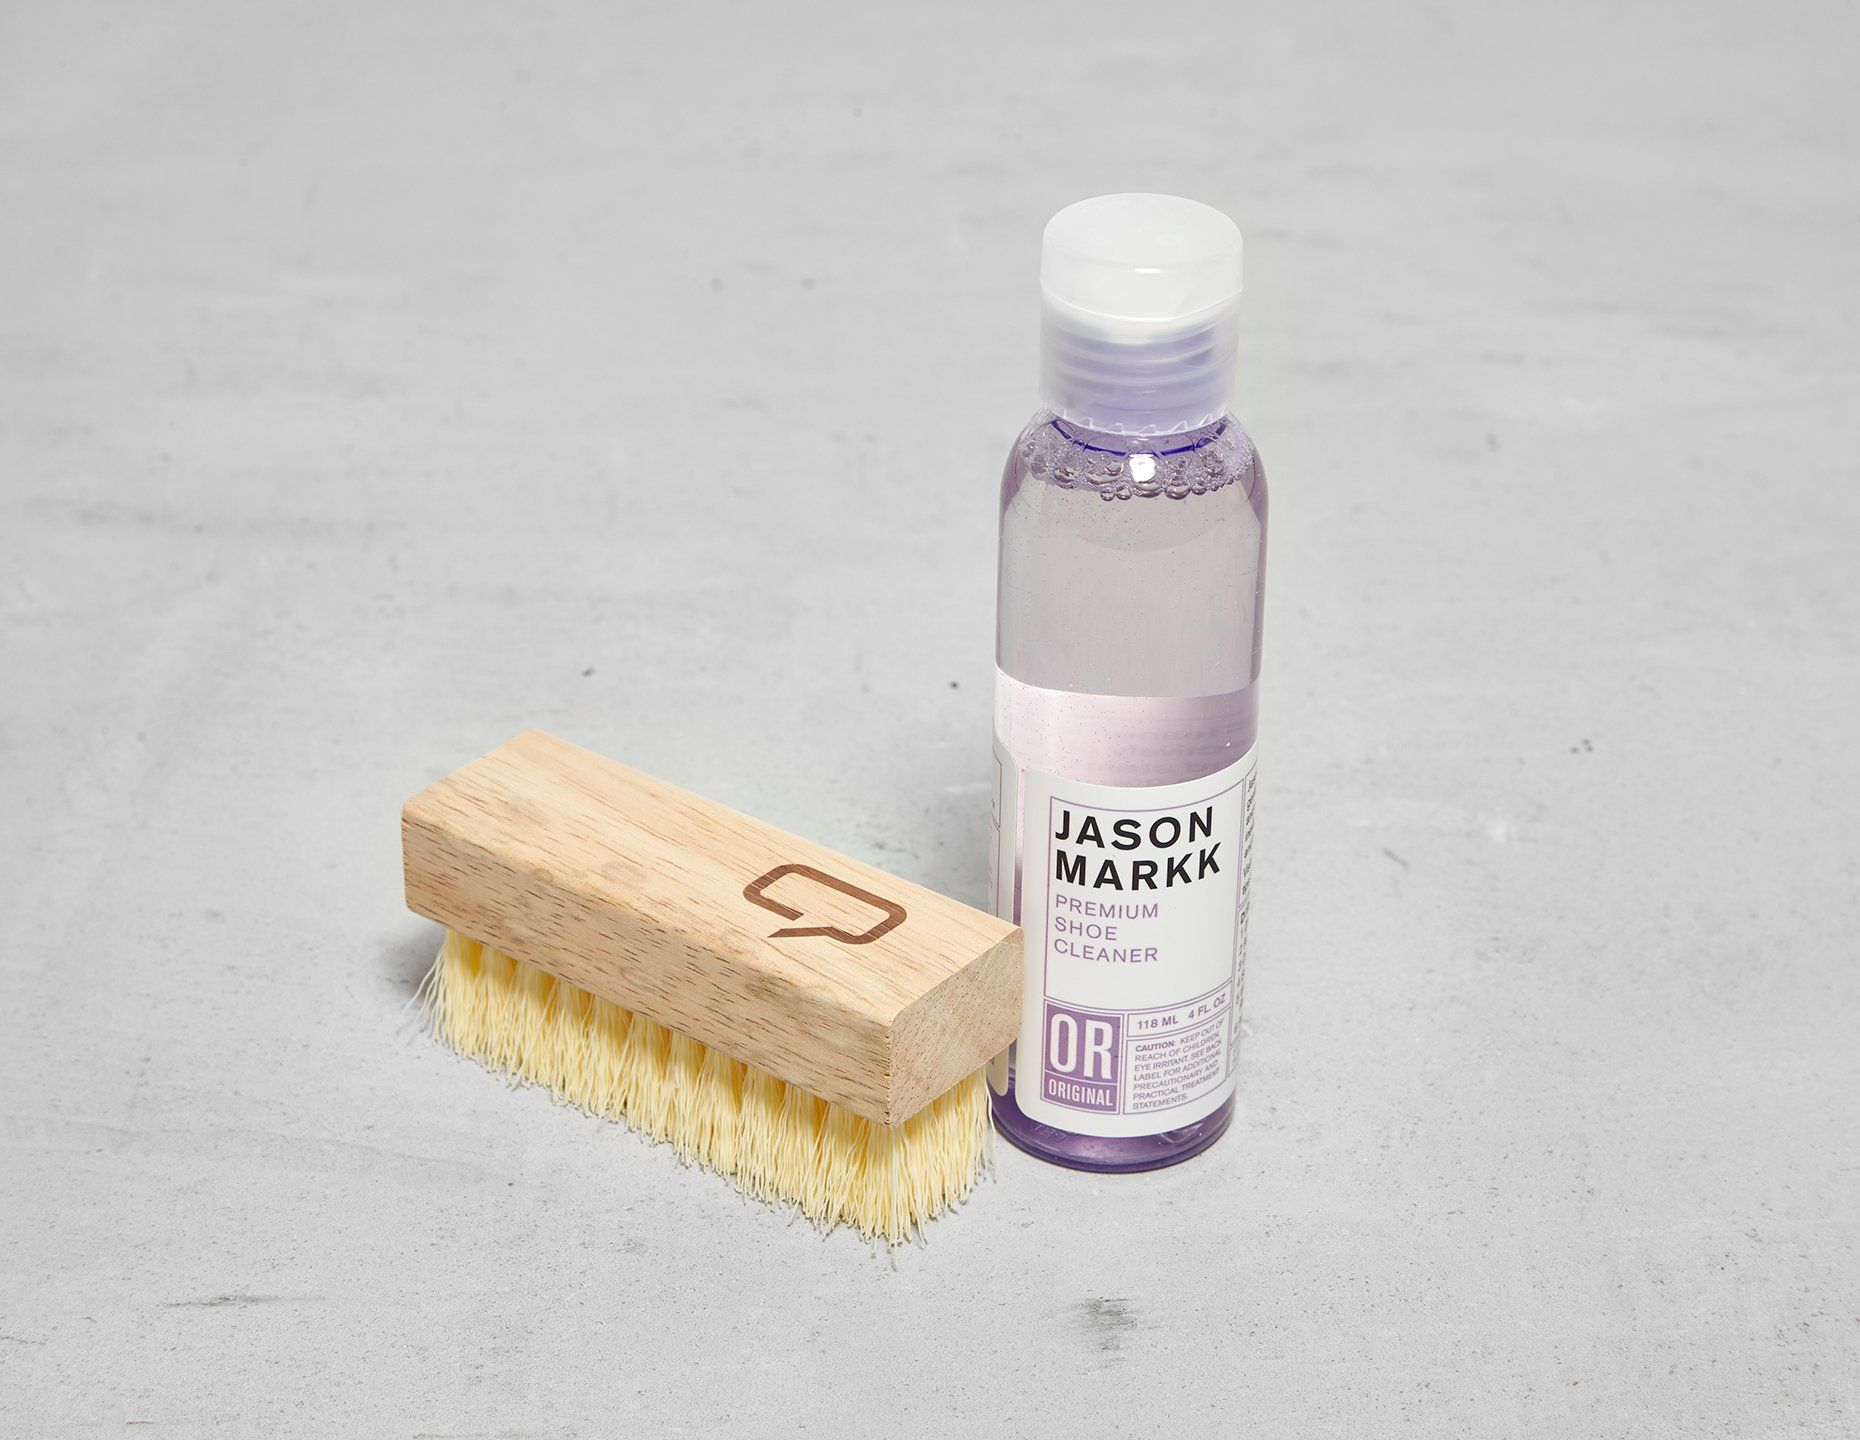 Jason Markk 4oz Premium Cleaning Kit